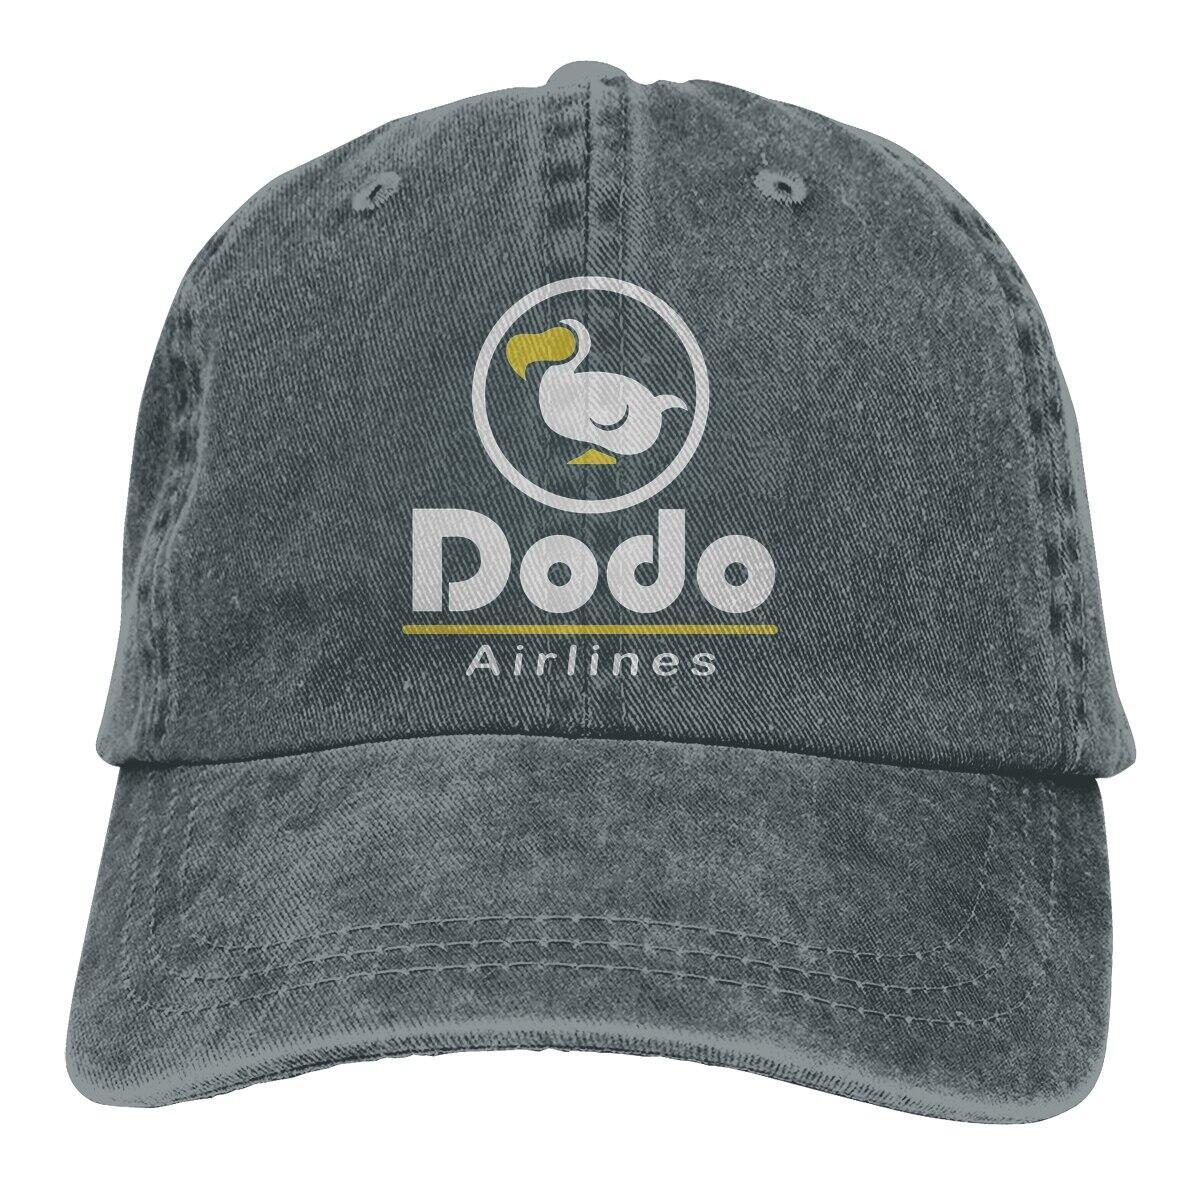 Dodo Airlines Baseball Style Snapback Hat, Dark Gray / One Size